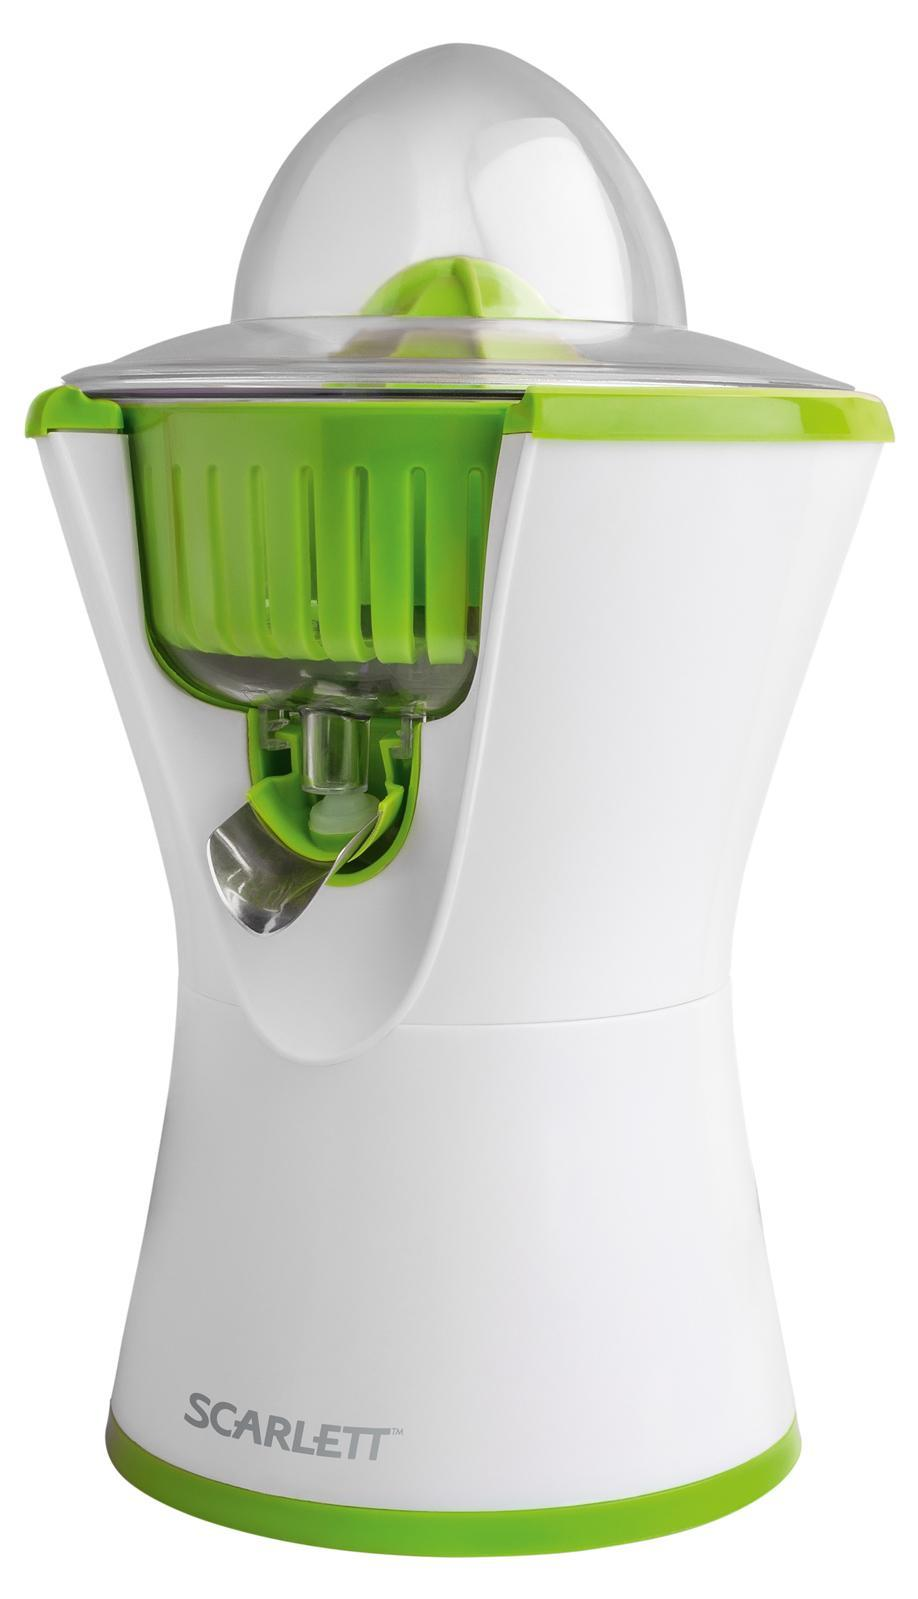 Scarlett SC-JE50C03, White Green соковыжималка для цитрусовыхSC-JE50C03